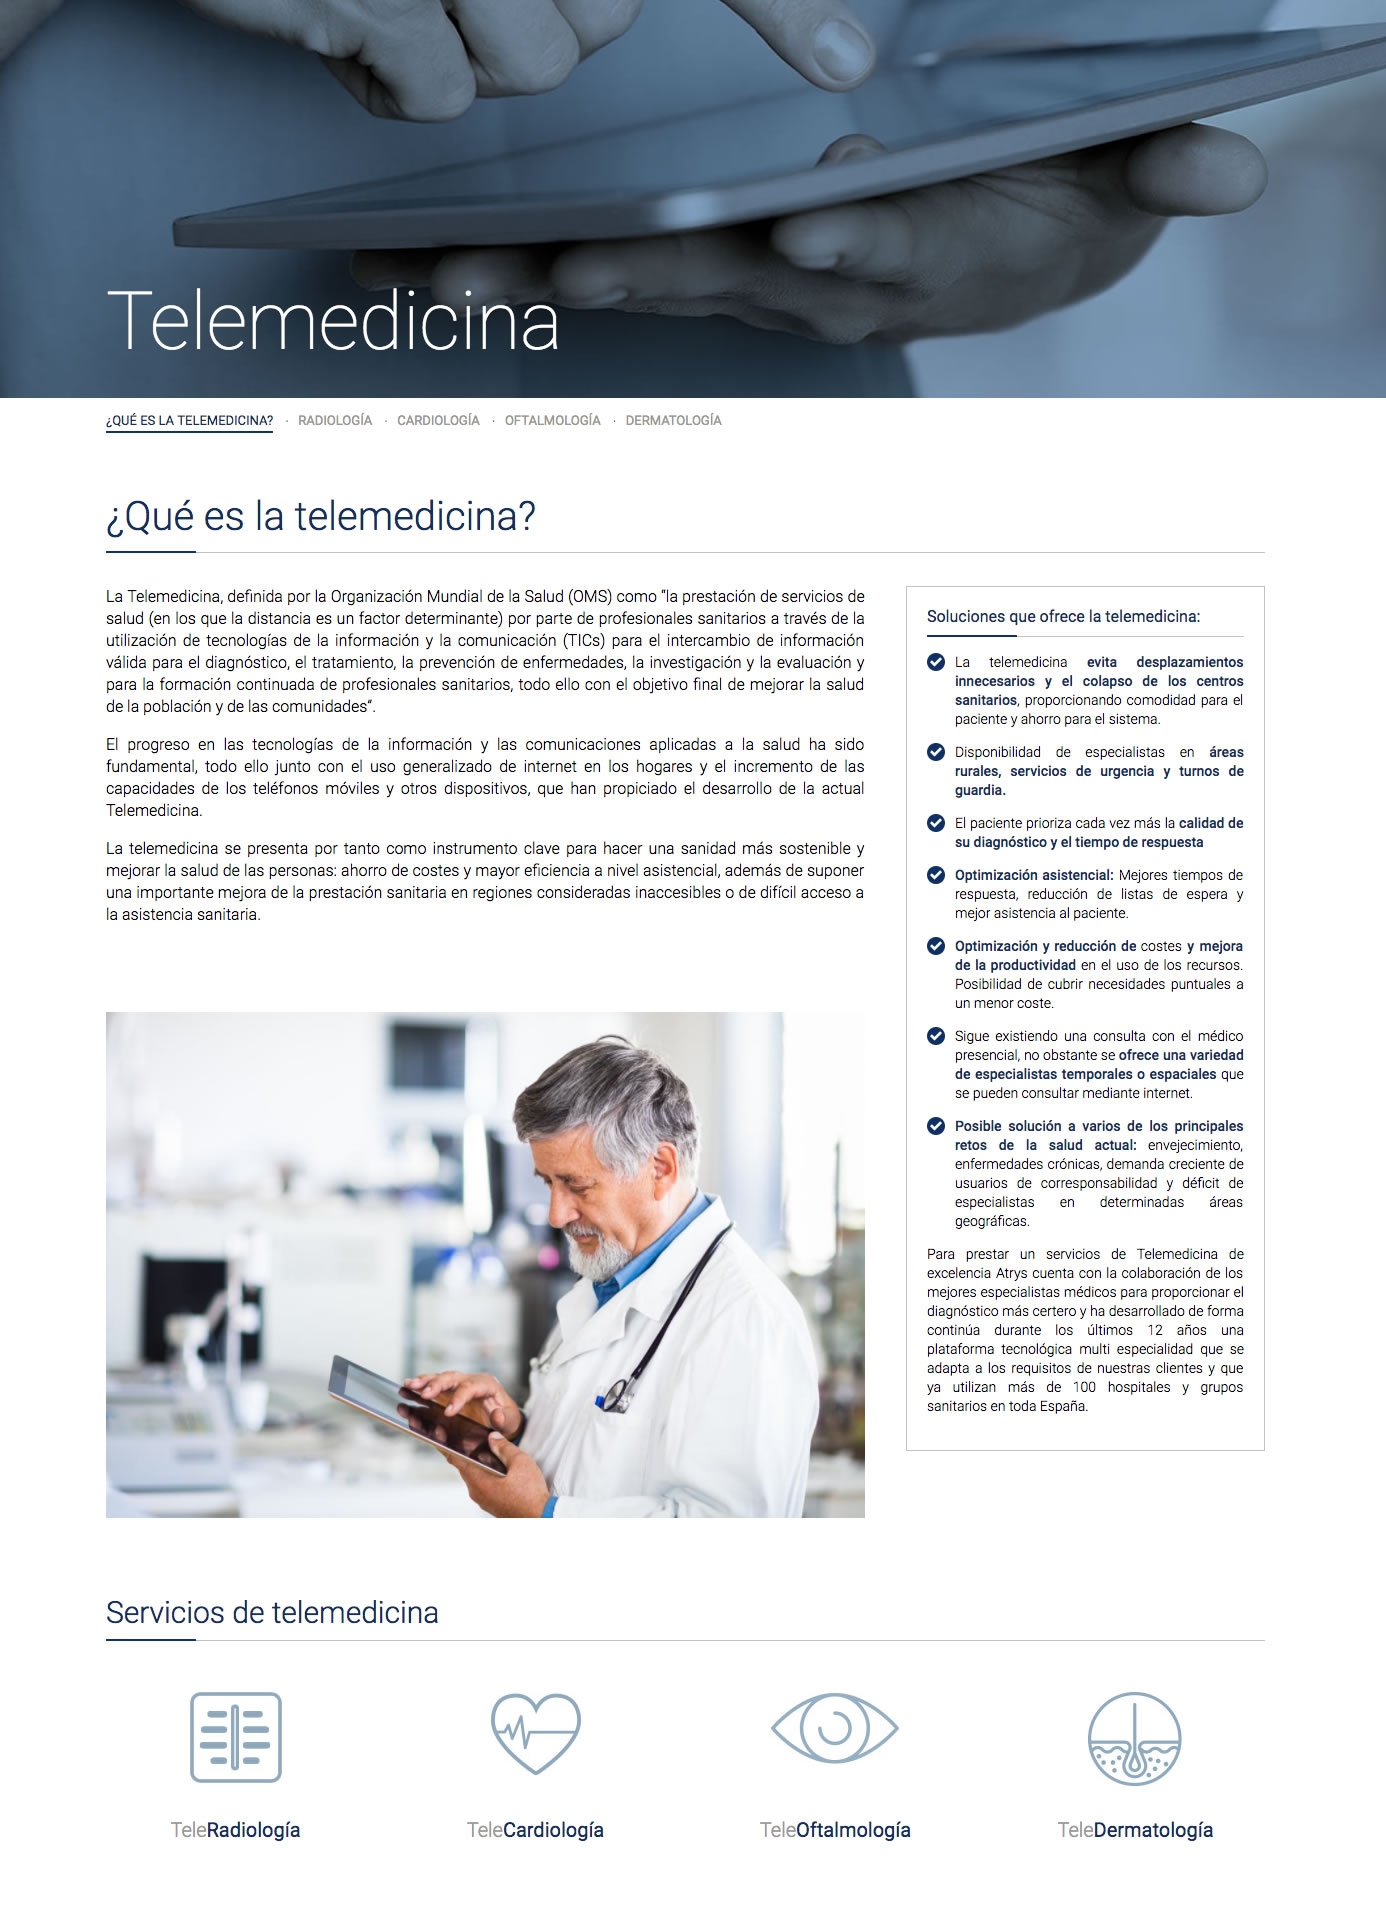 Atrys - Telemedecine